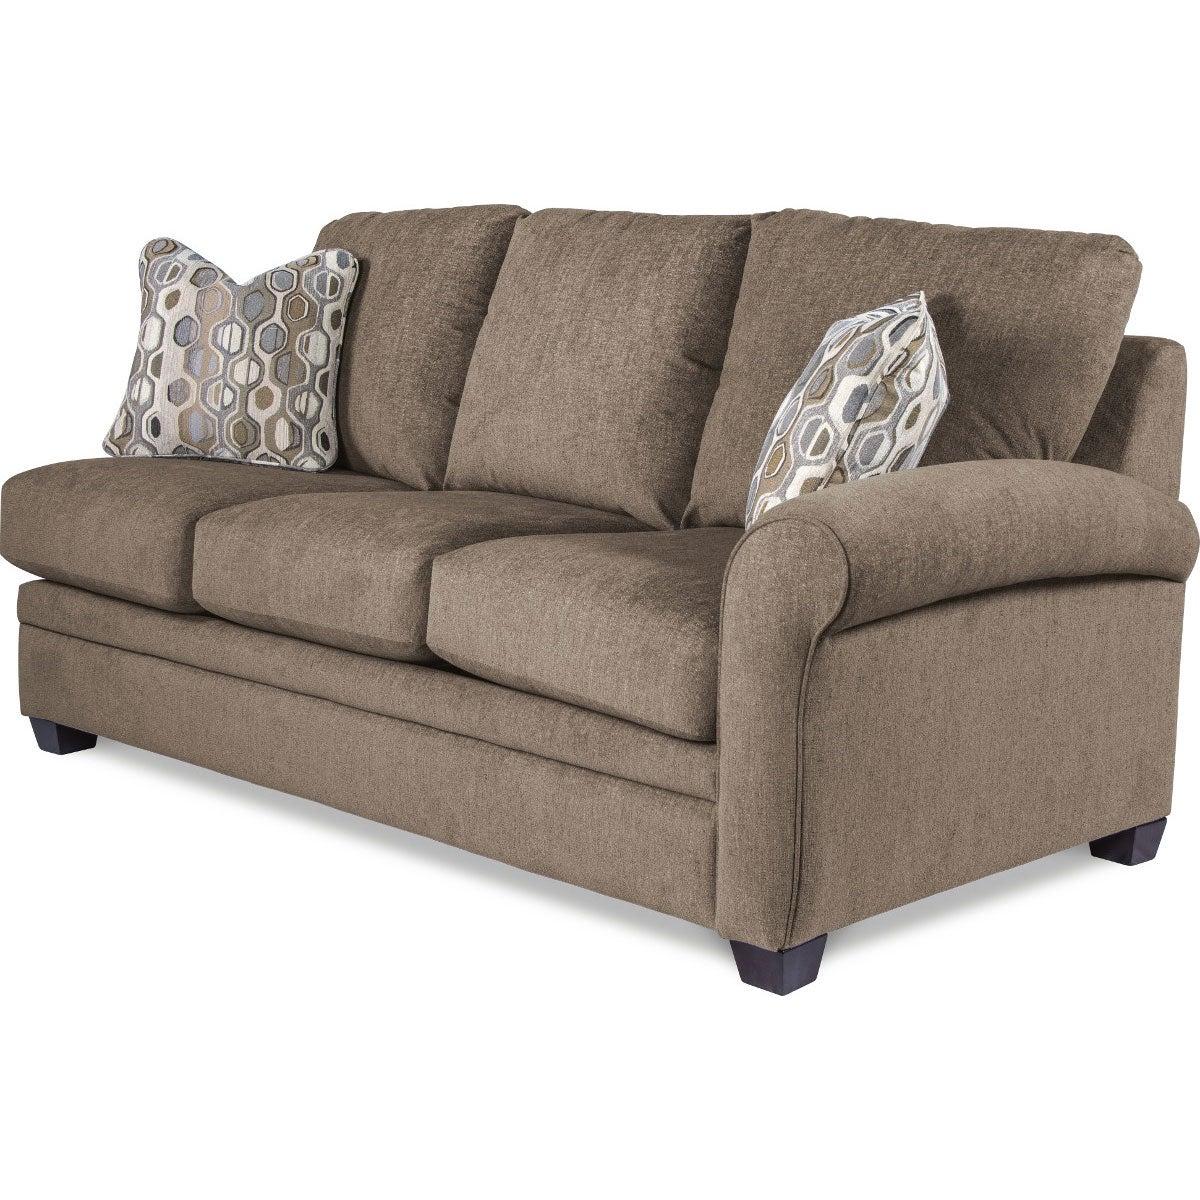 Natalie Premier Left Arm Sitting Sofa